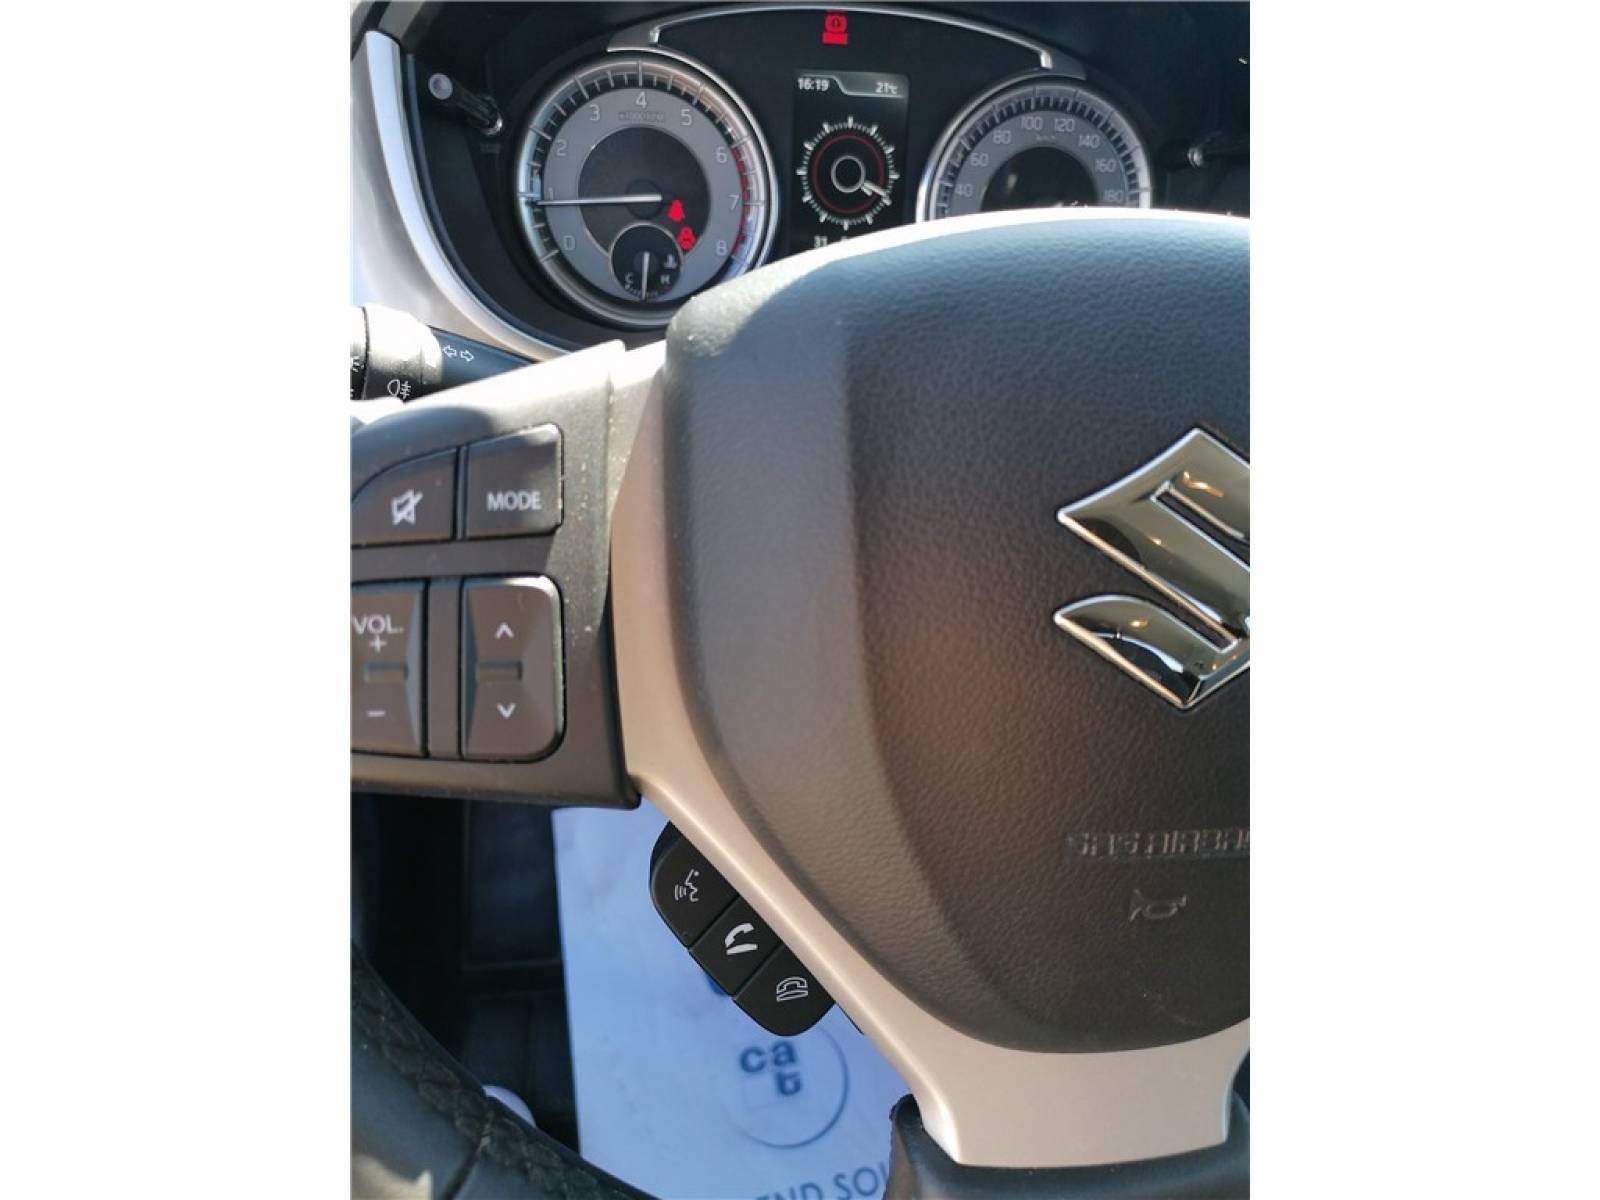 SUZUKI Vitara 1.0 Boosterjet - véhicule d'occasion - Groupe Guillet - Opel Magicauto - Chalon-sur-Saône - 71380 - Saint-Marcel - 23